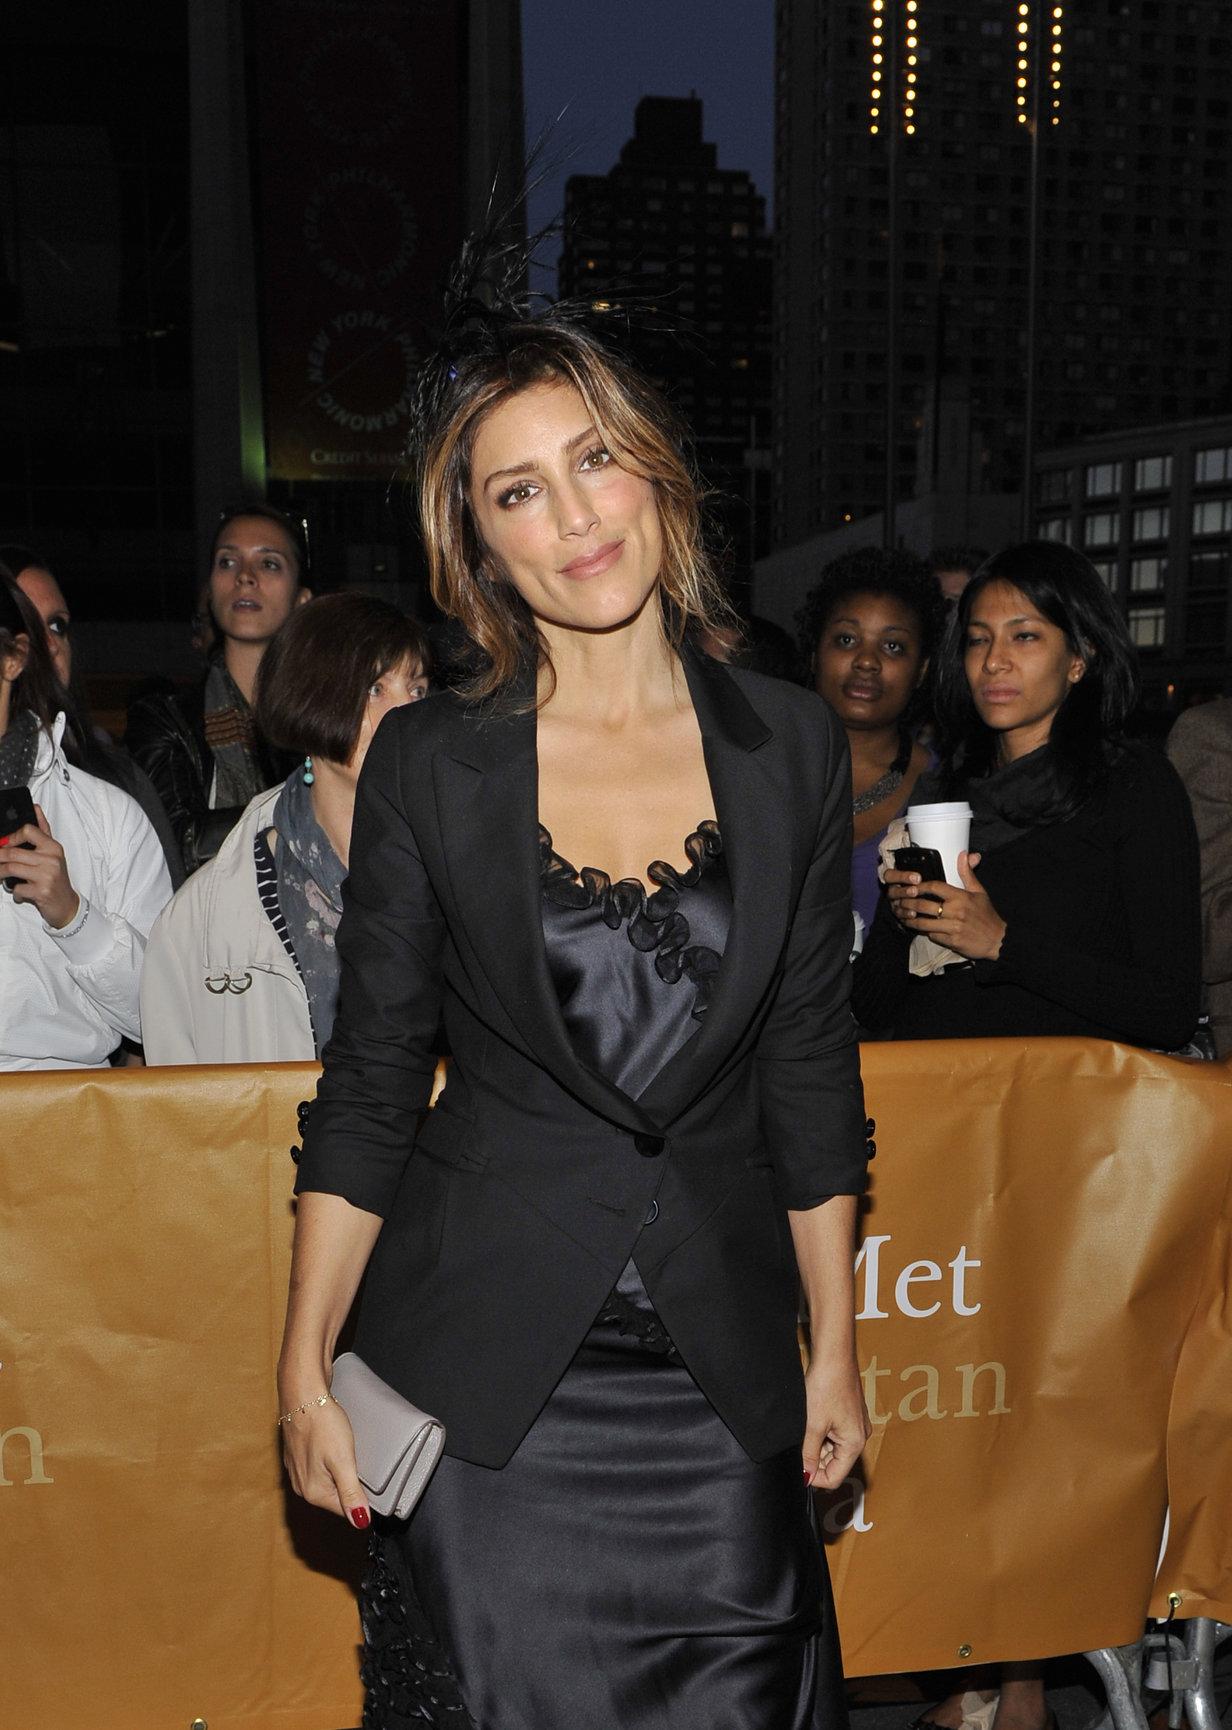 Jennifer Esposito 2012 Metropolitan Opera Season Opening Night  L'Elisir D'Amore  (Sep 24, 2012)